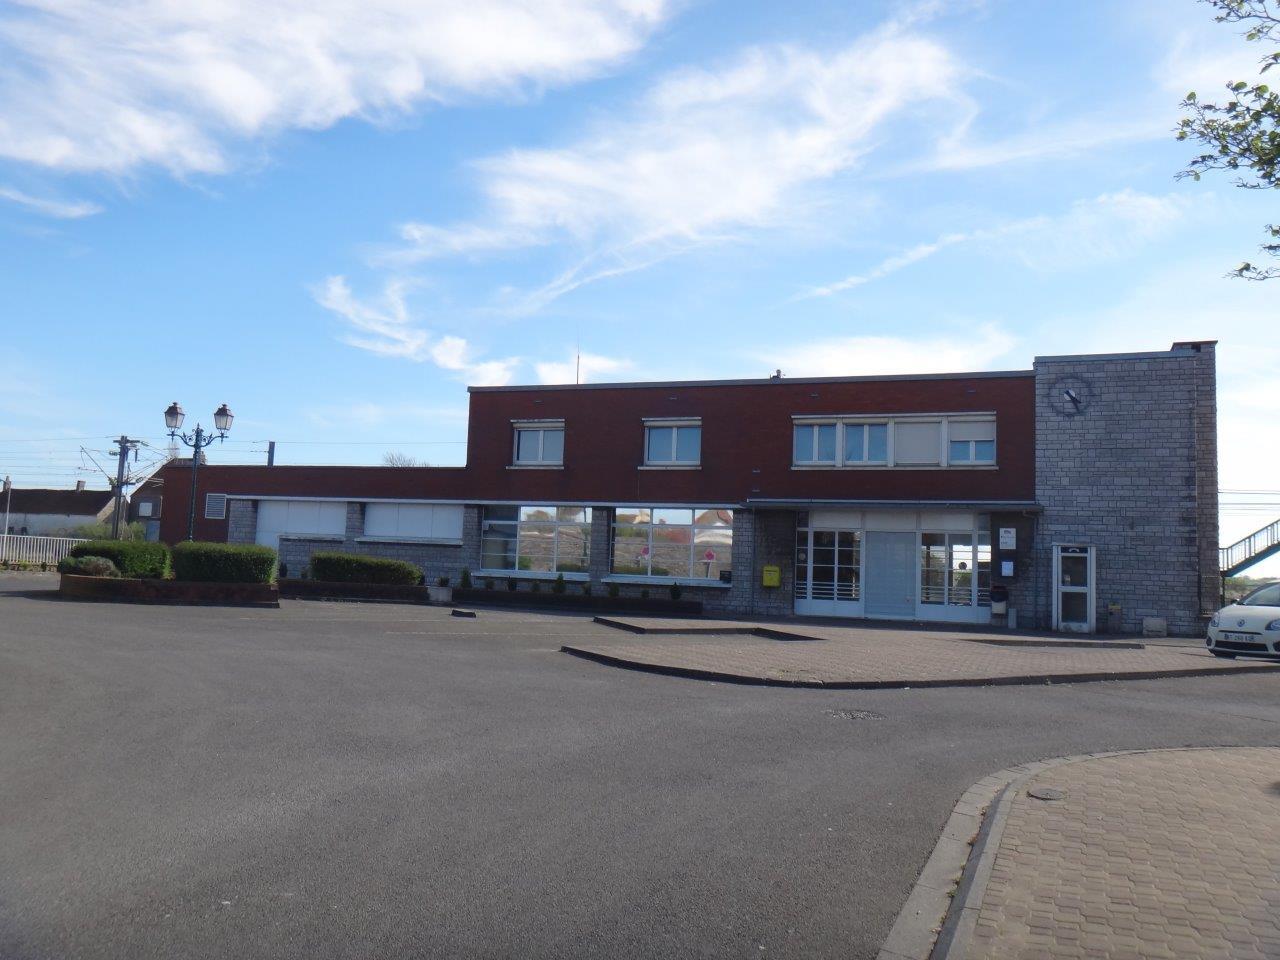 gare-de-marquise-rinxent-train-station